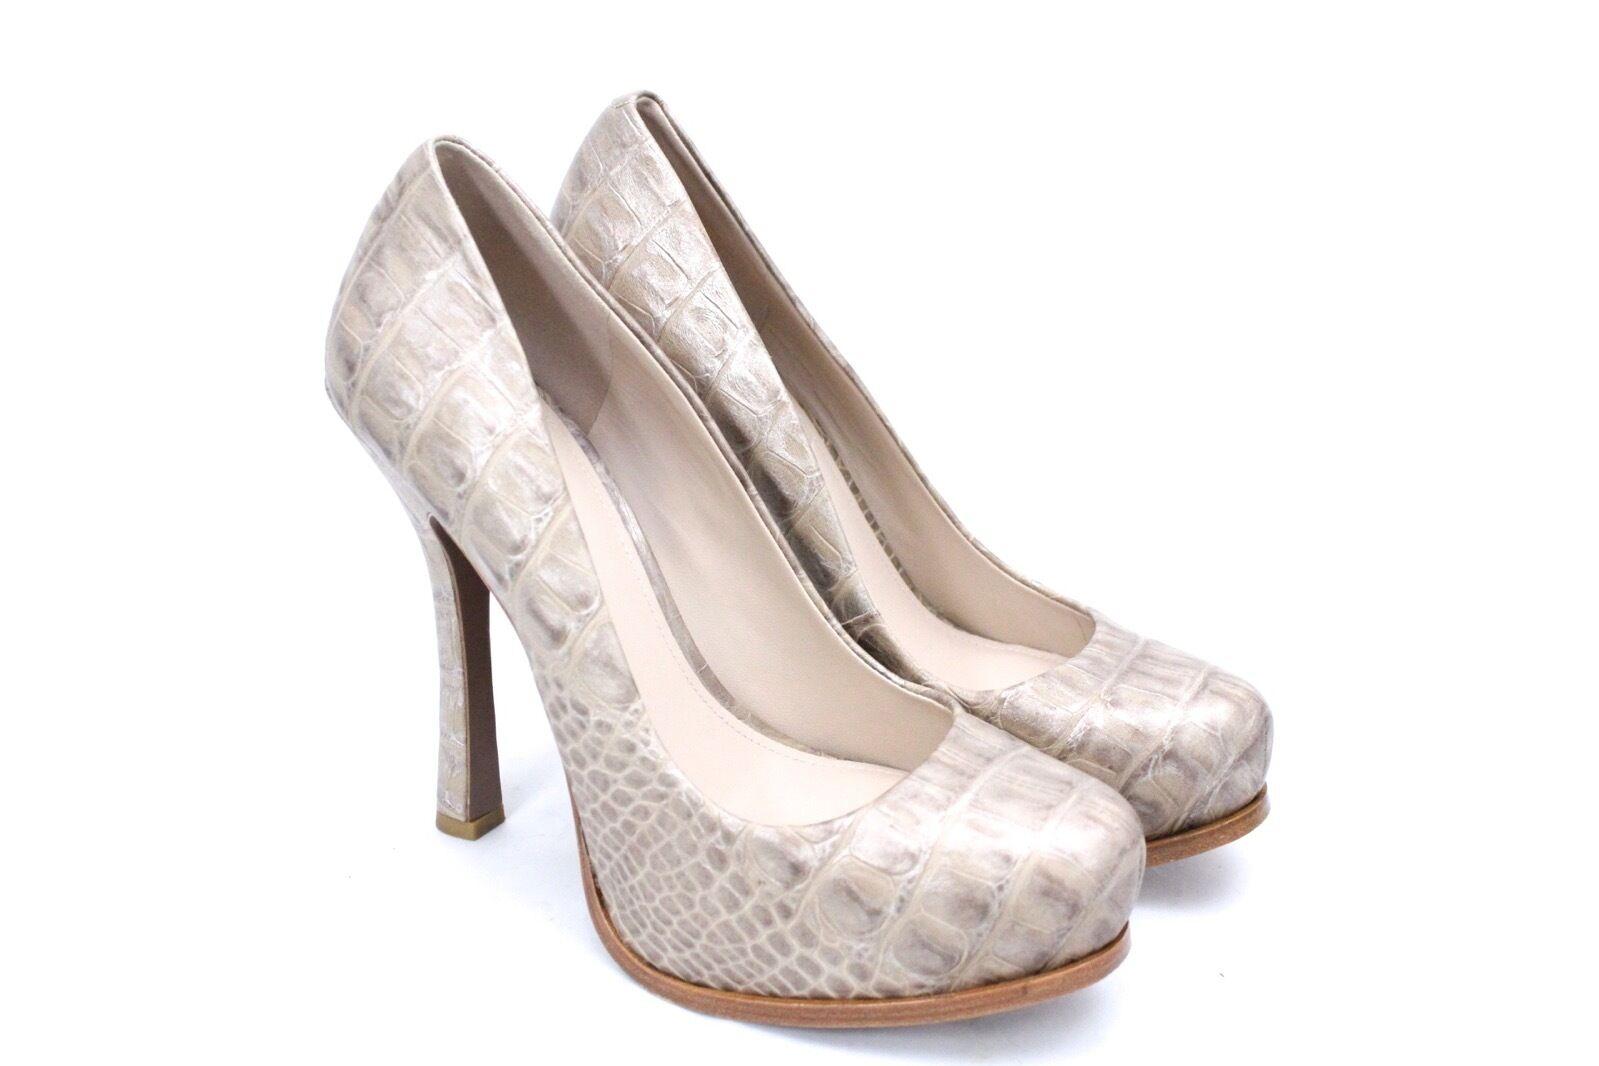 Joan & David Guzman Nude Taupe Croco Embossed Platform Stiletto Heels 10M